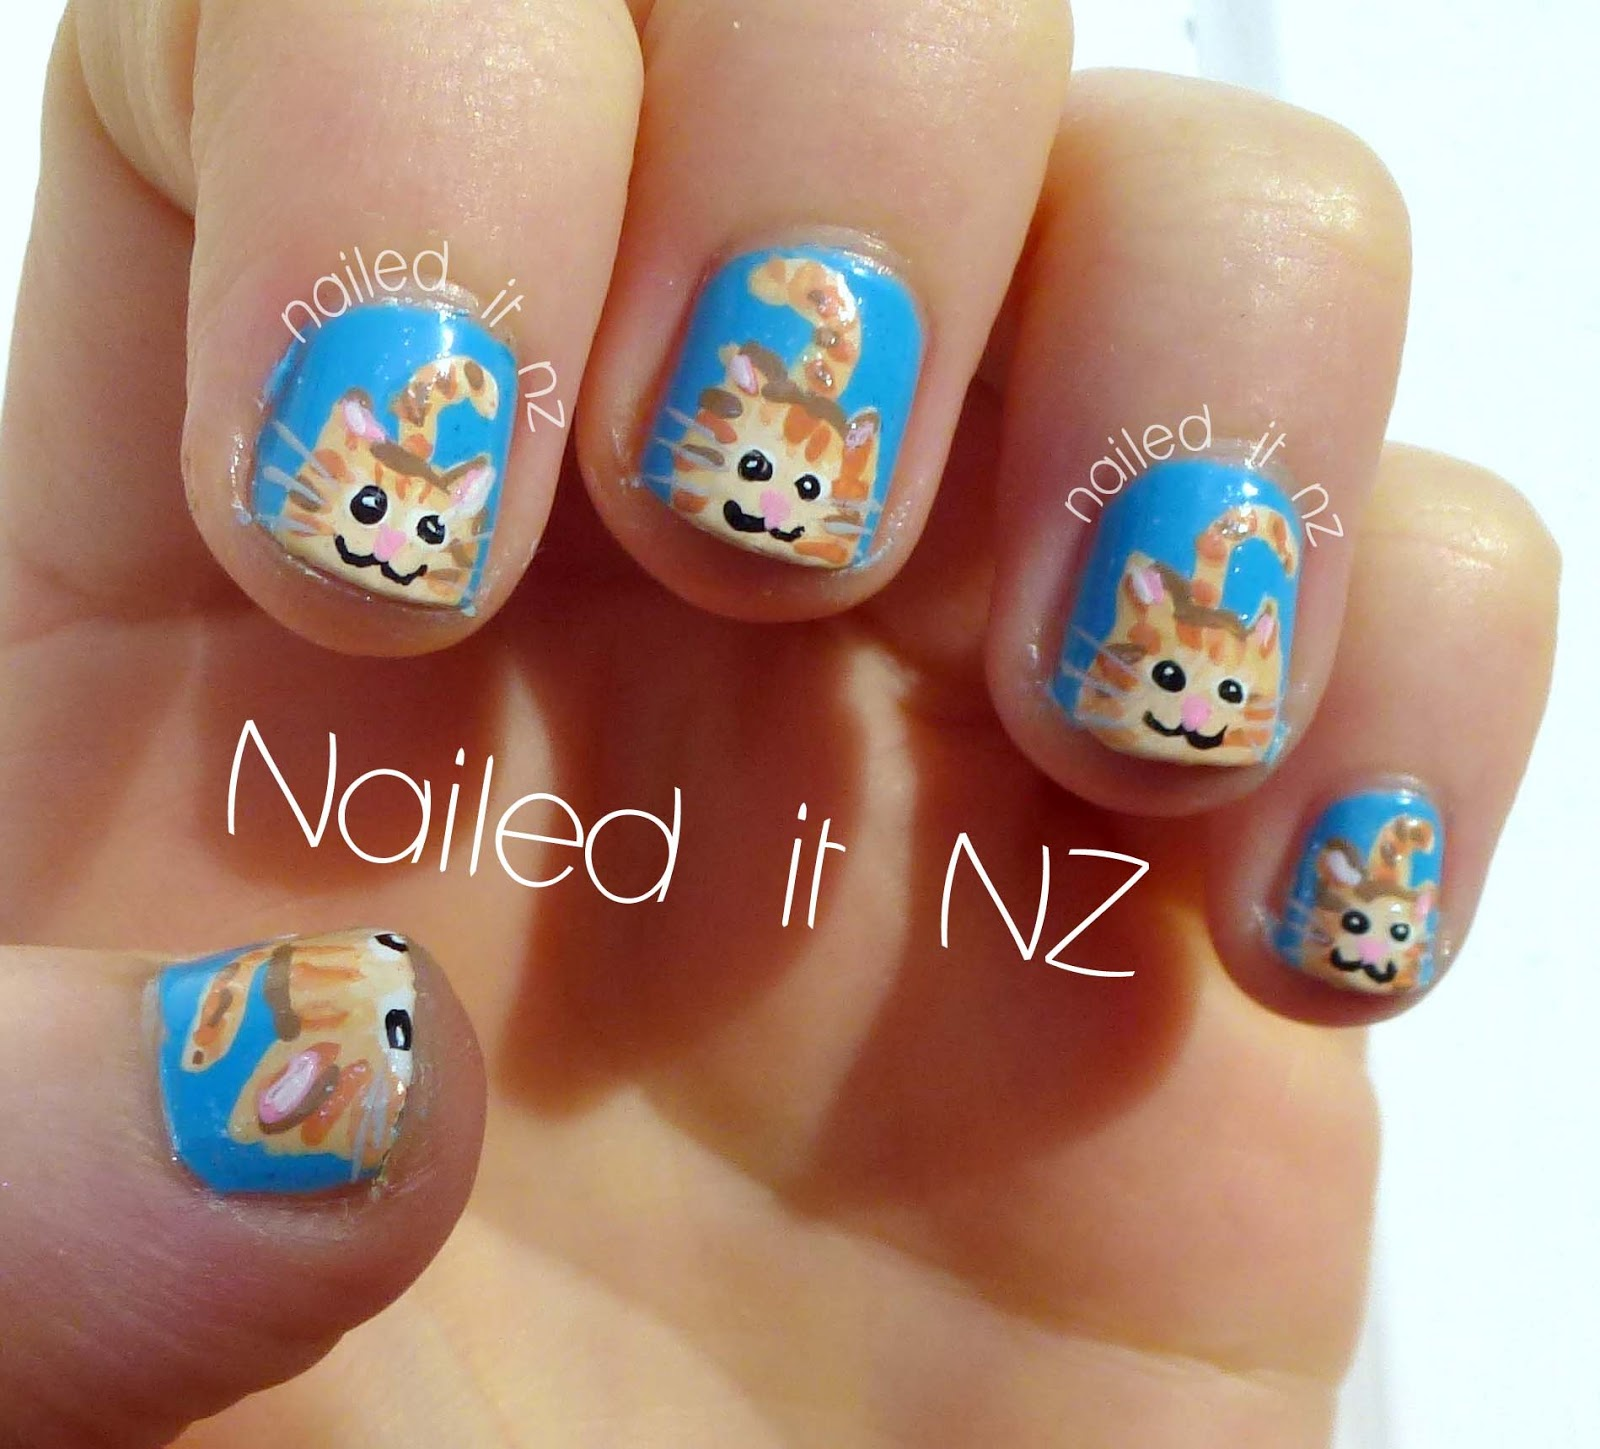 Ginger tabby cat nails!